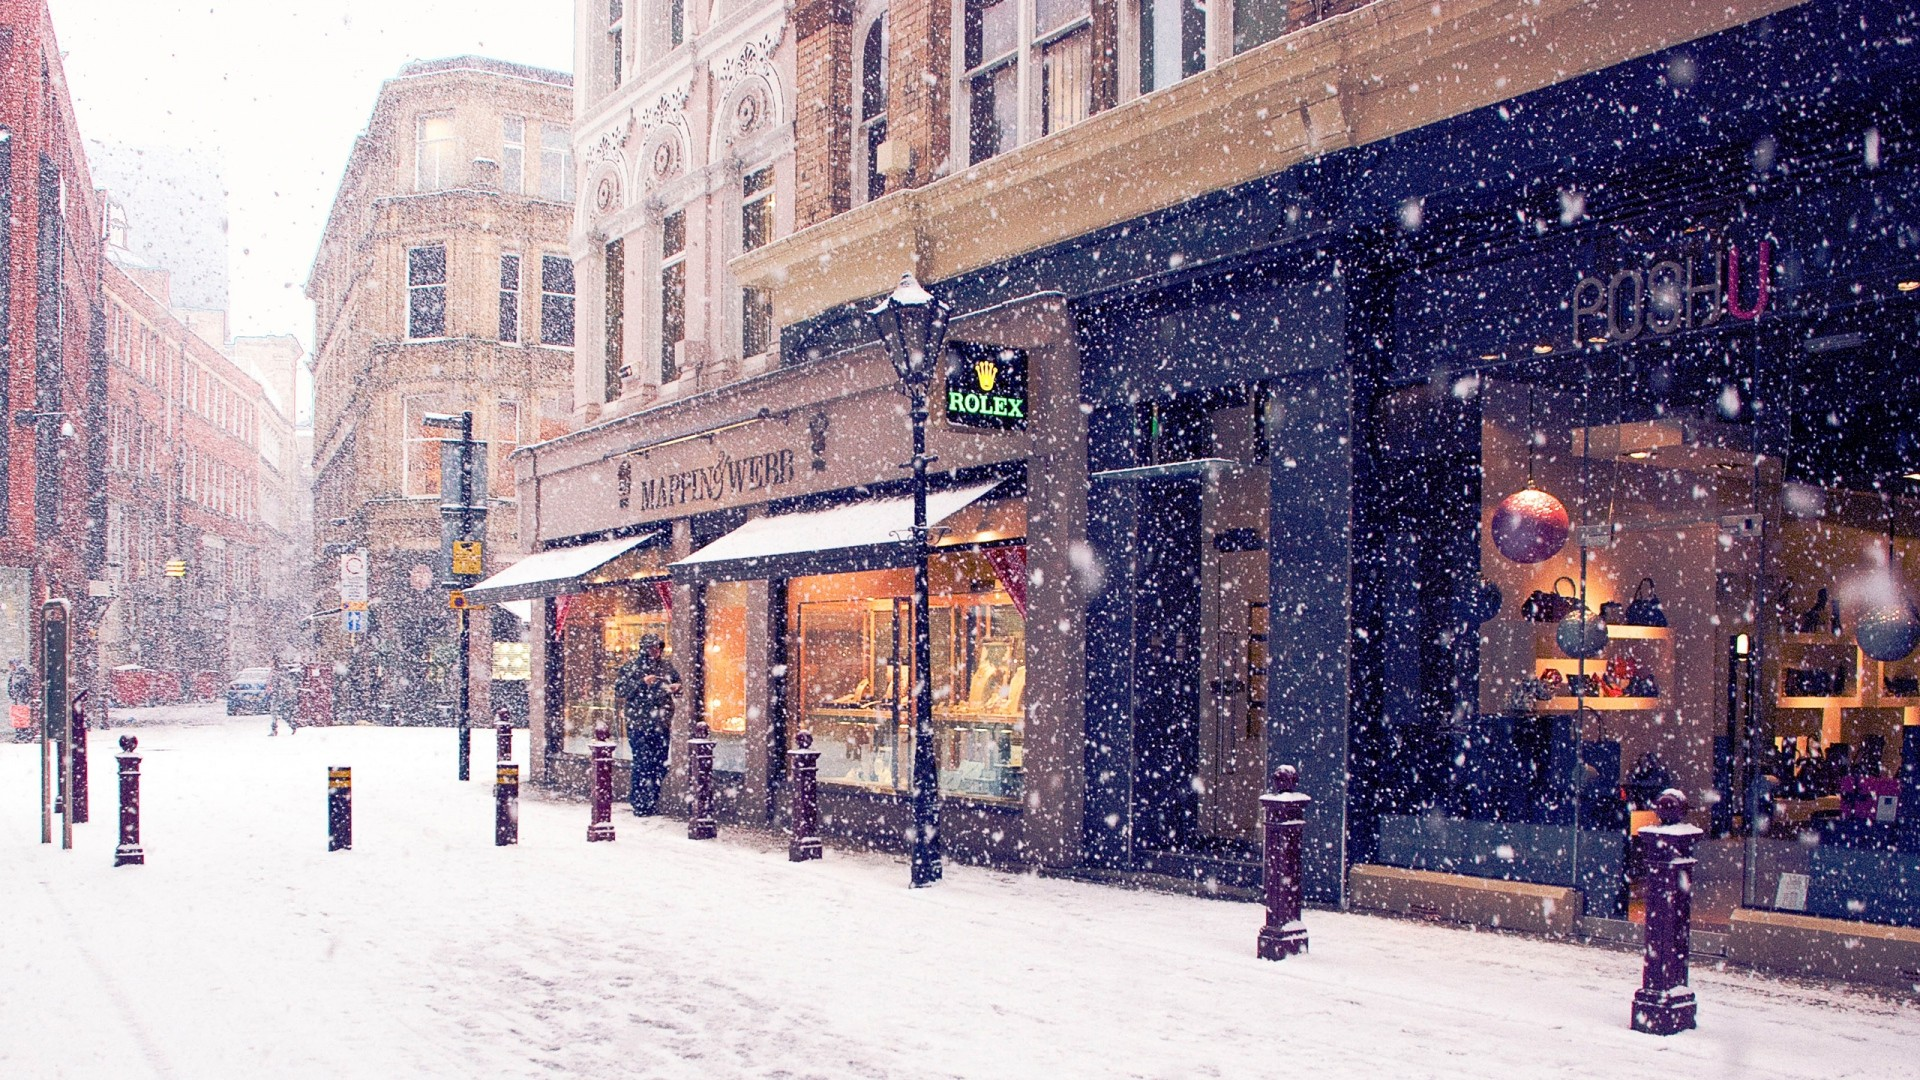 1920x1080 Snow City Wallpaper